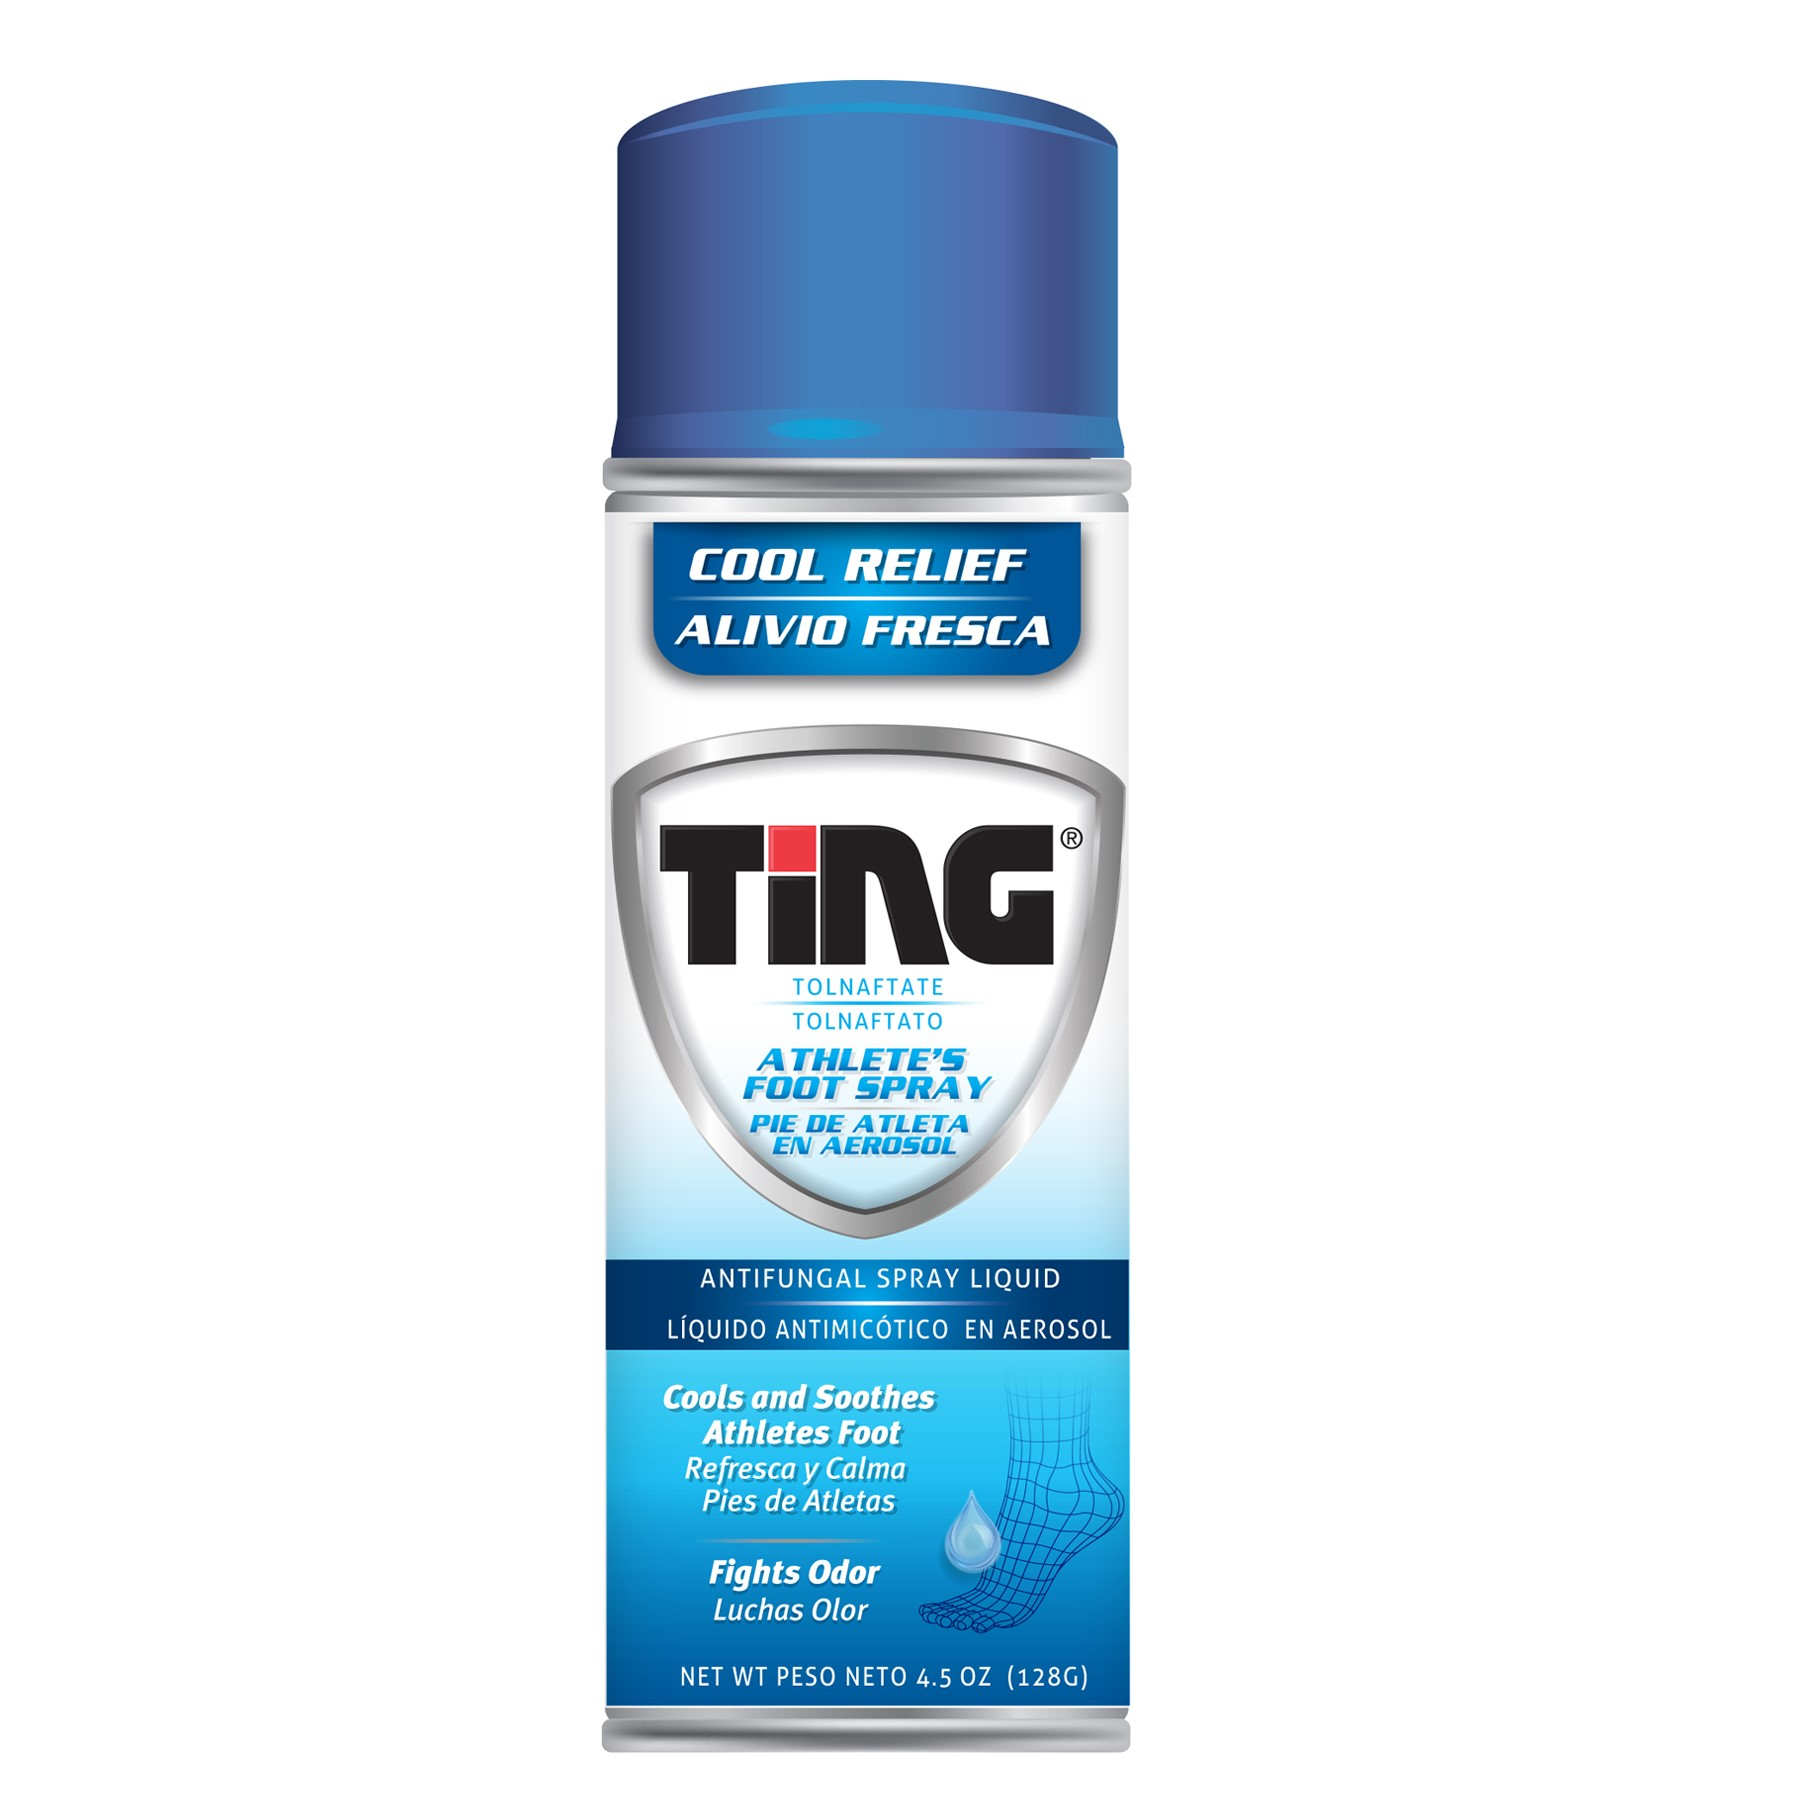 Ting Athlete's Foot Spray, 4.5 Fl Oz